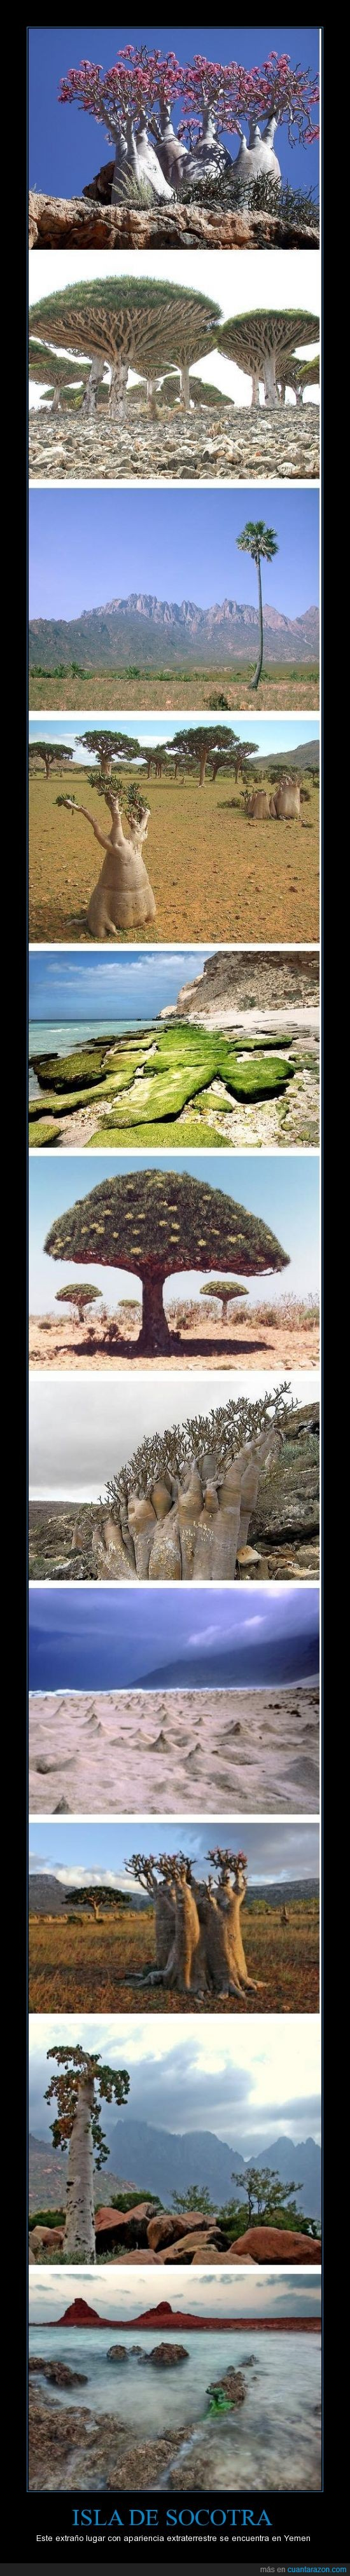 extraterrestre,isla extraña,raro,socotra,yemen